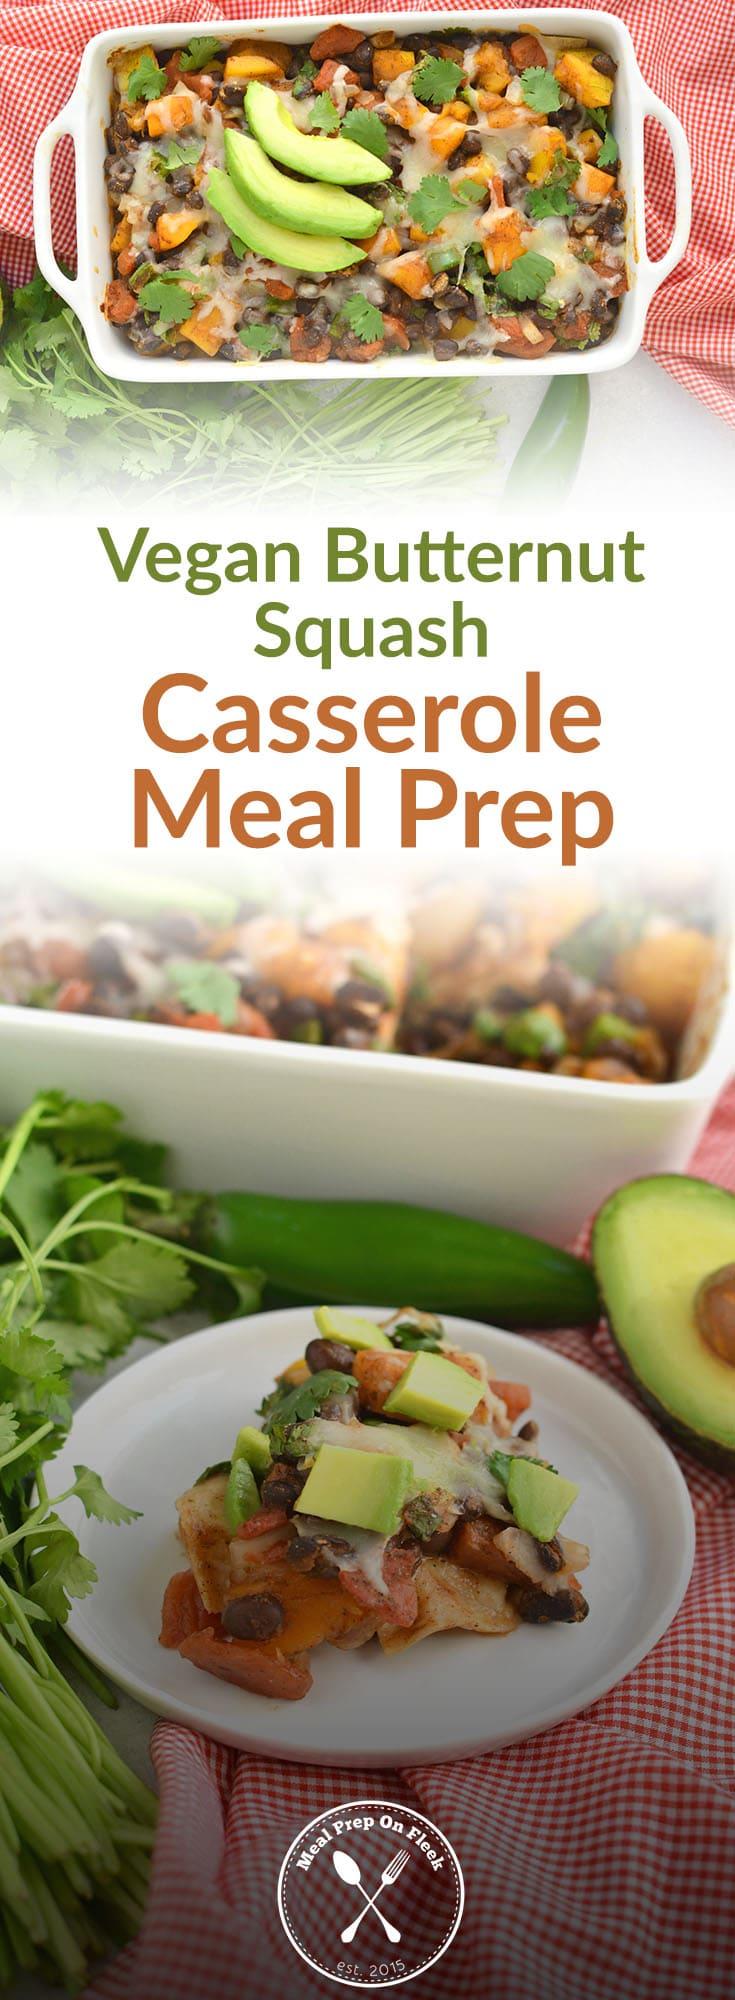 Vegan Butternut Squash Casserole Meal Prep